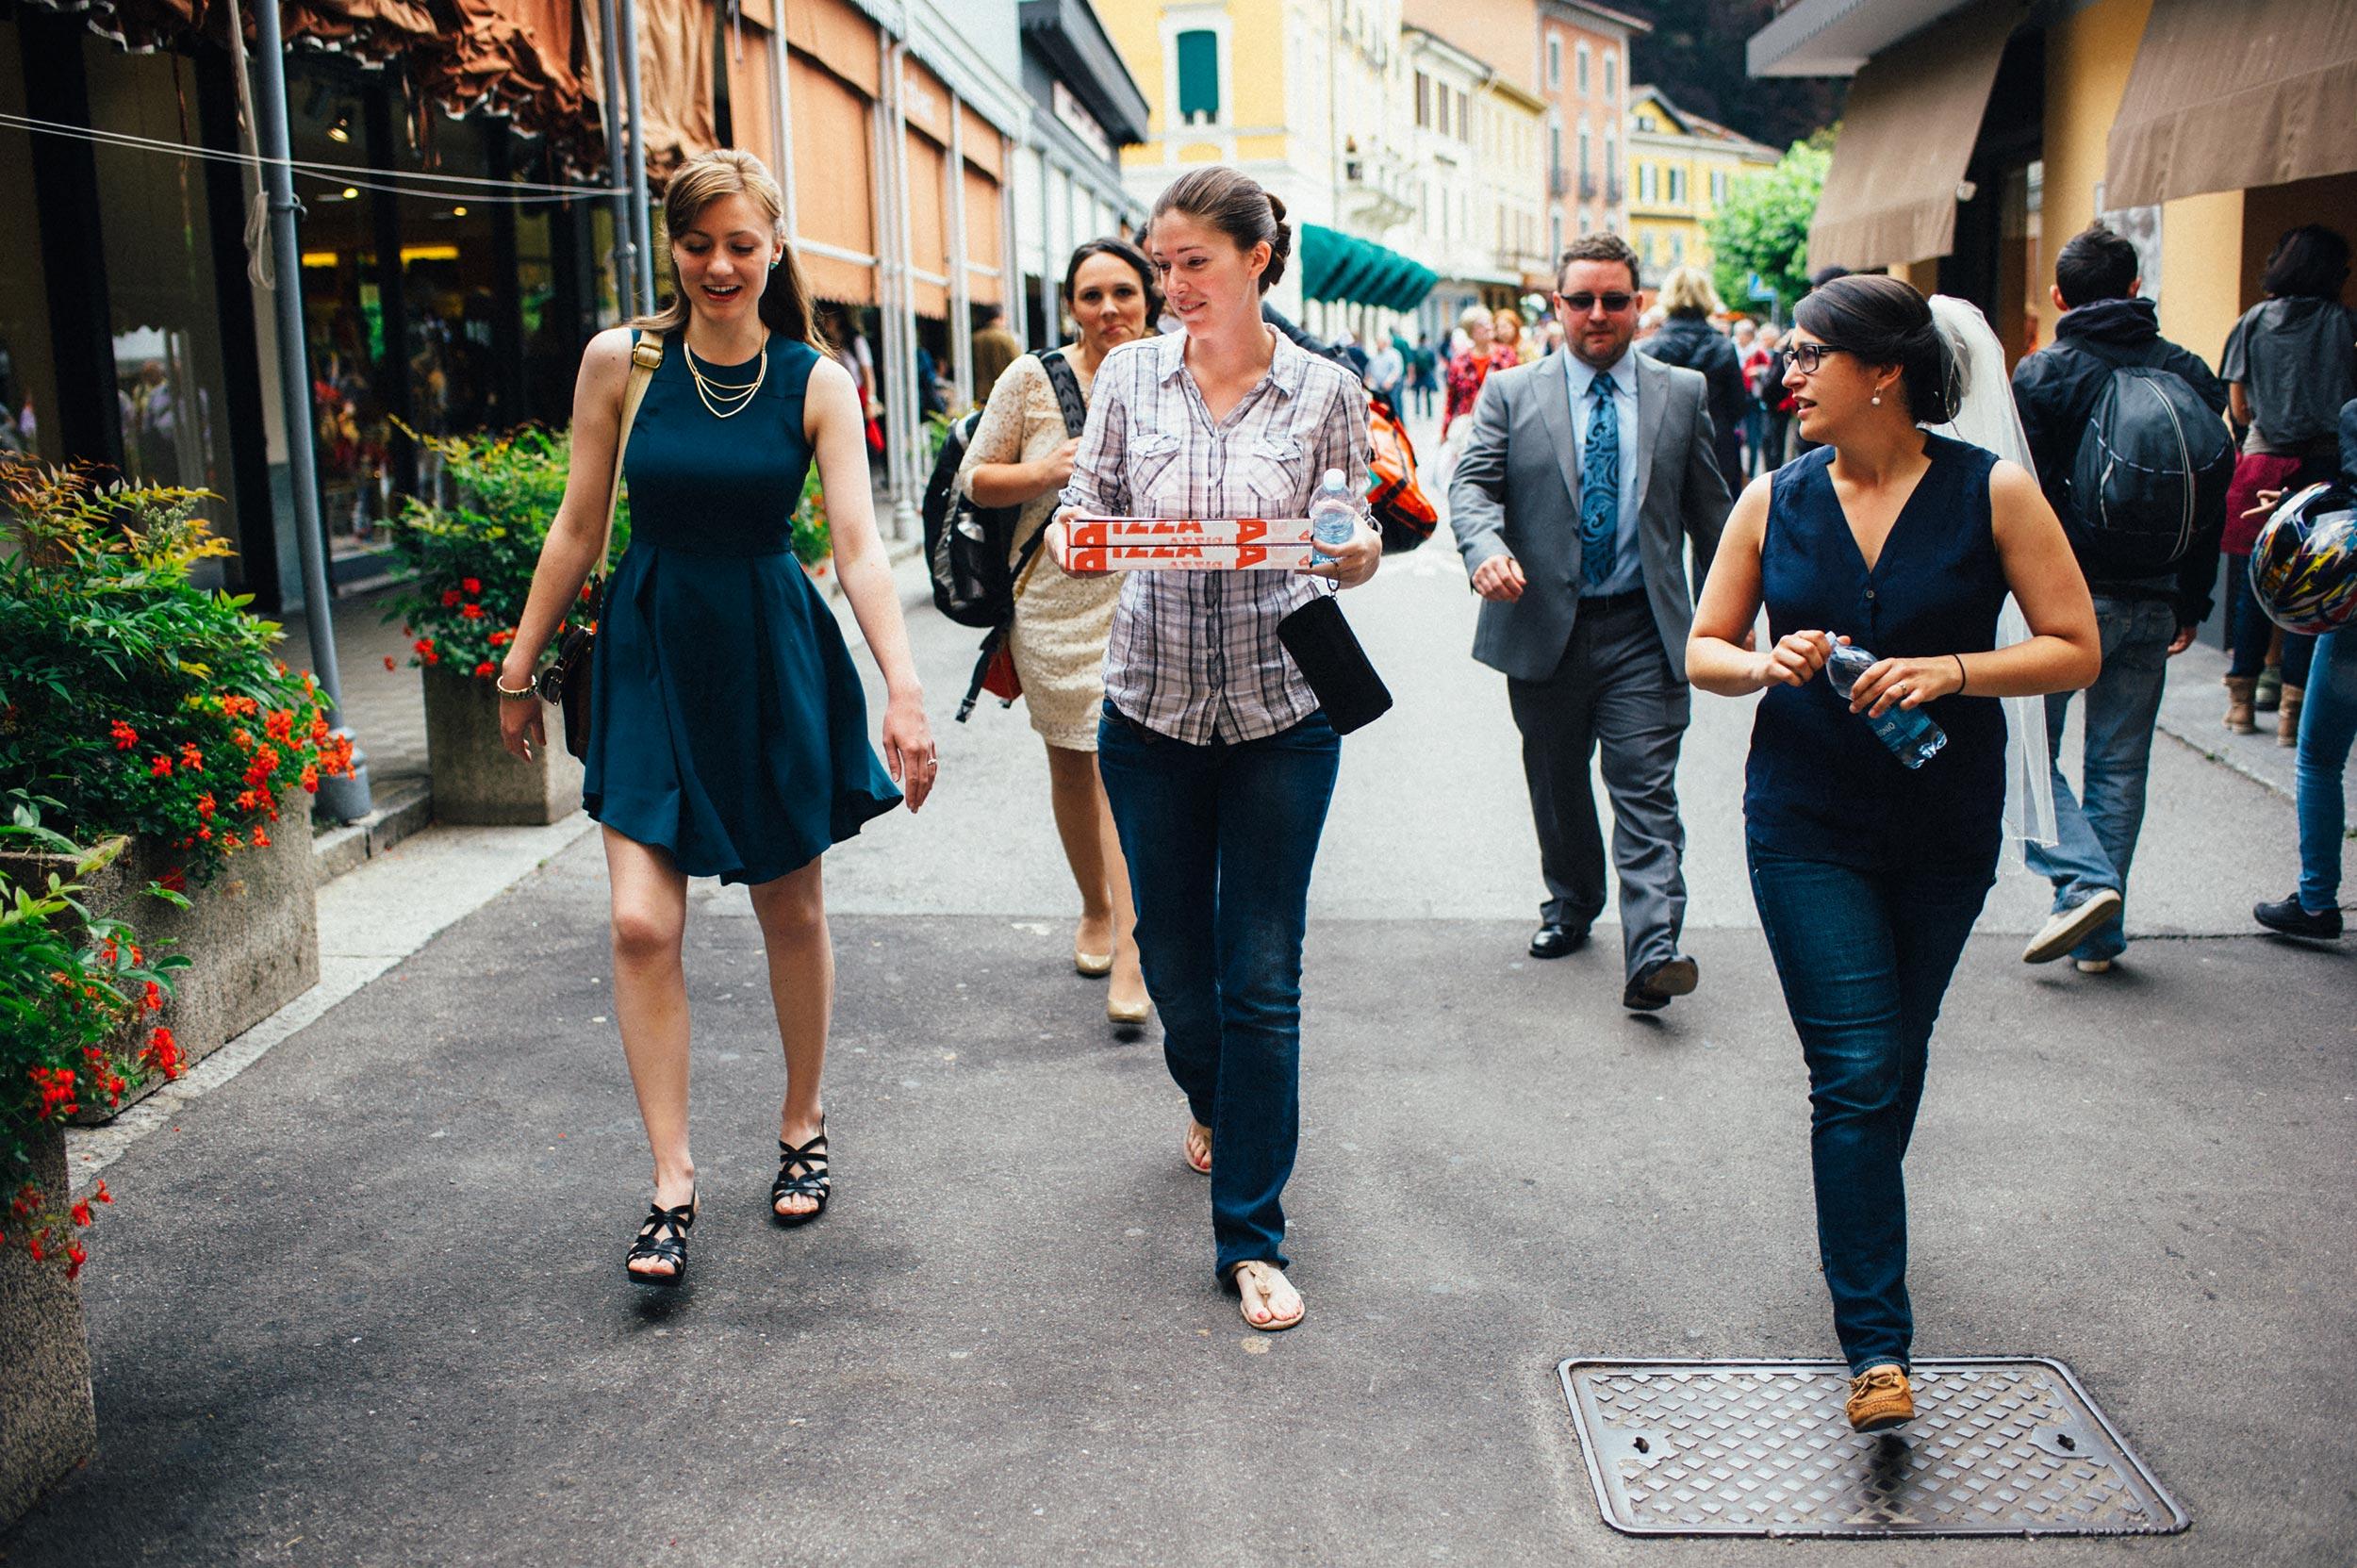 2015-Jon-Lauren-Bellagio-Lake-Como-Wedding-Photographer-Italy-Alessandro-Avenali-3.jpg